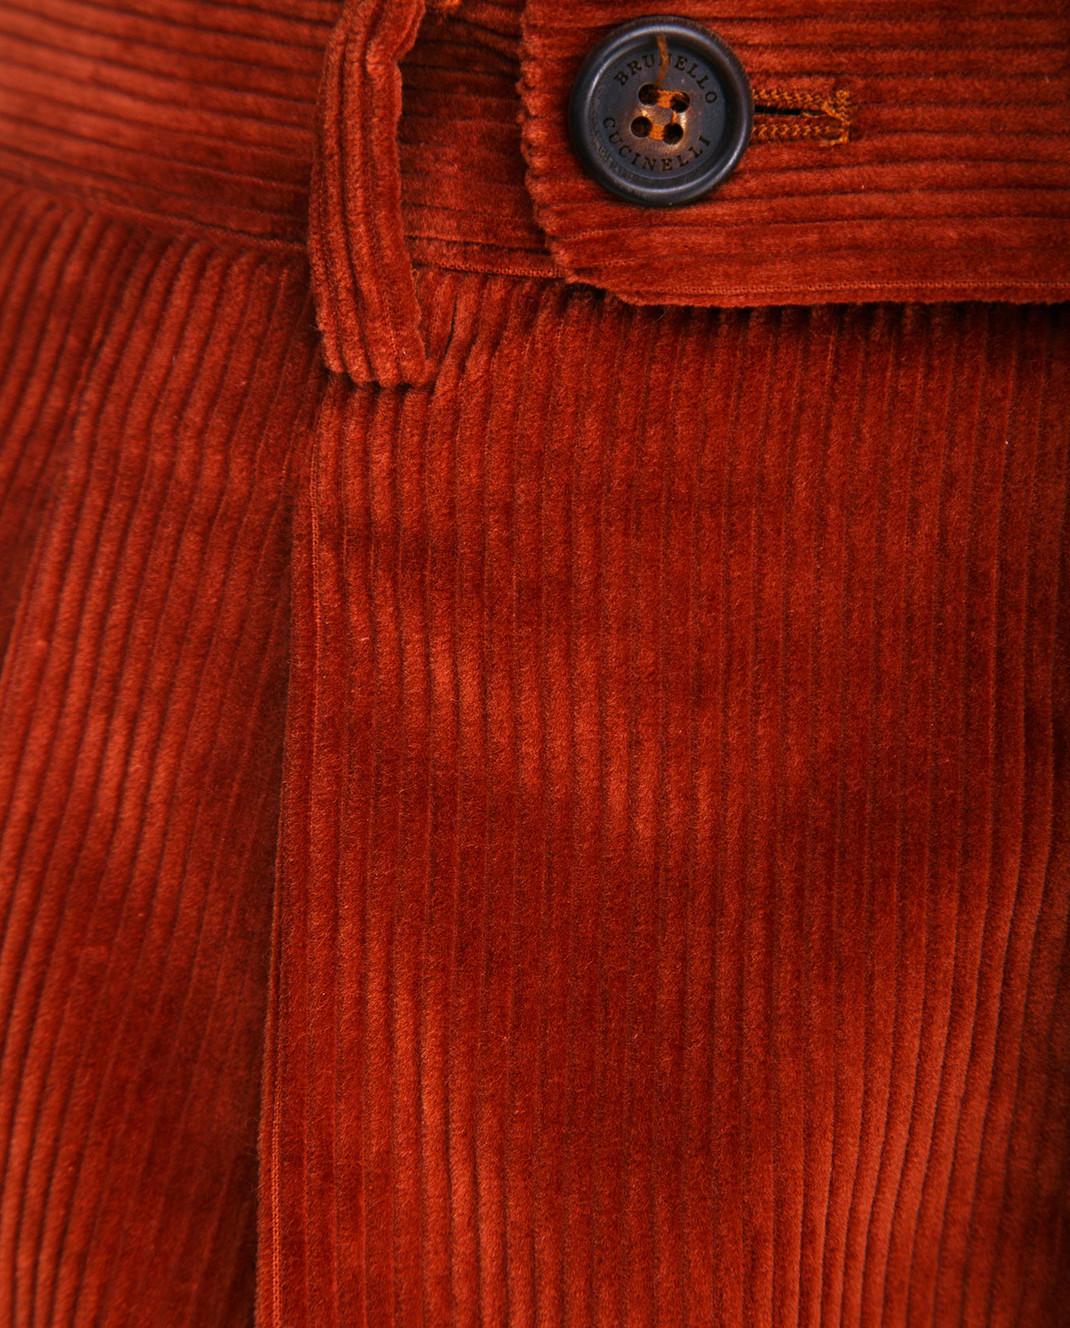 Brunello Cucinelli Терракотовые брюки ME233S2100 изображение 3